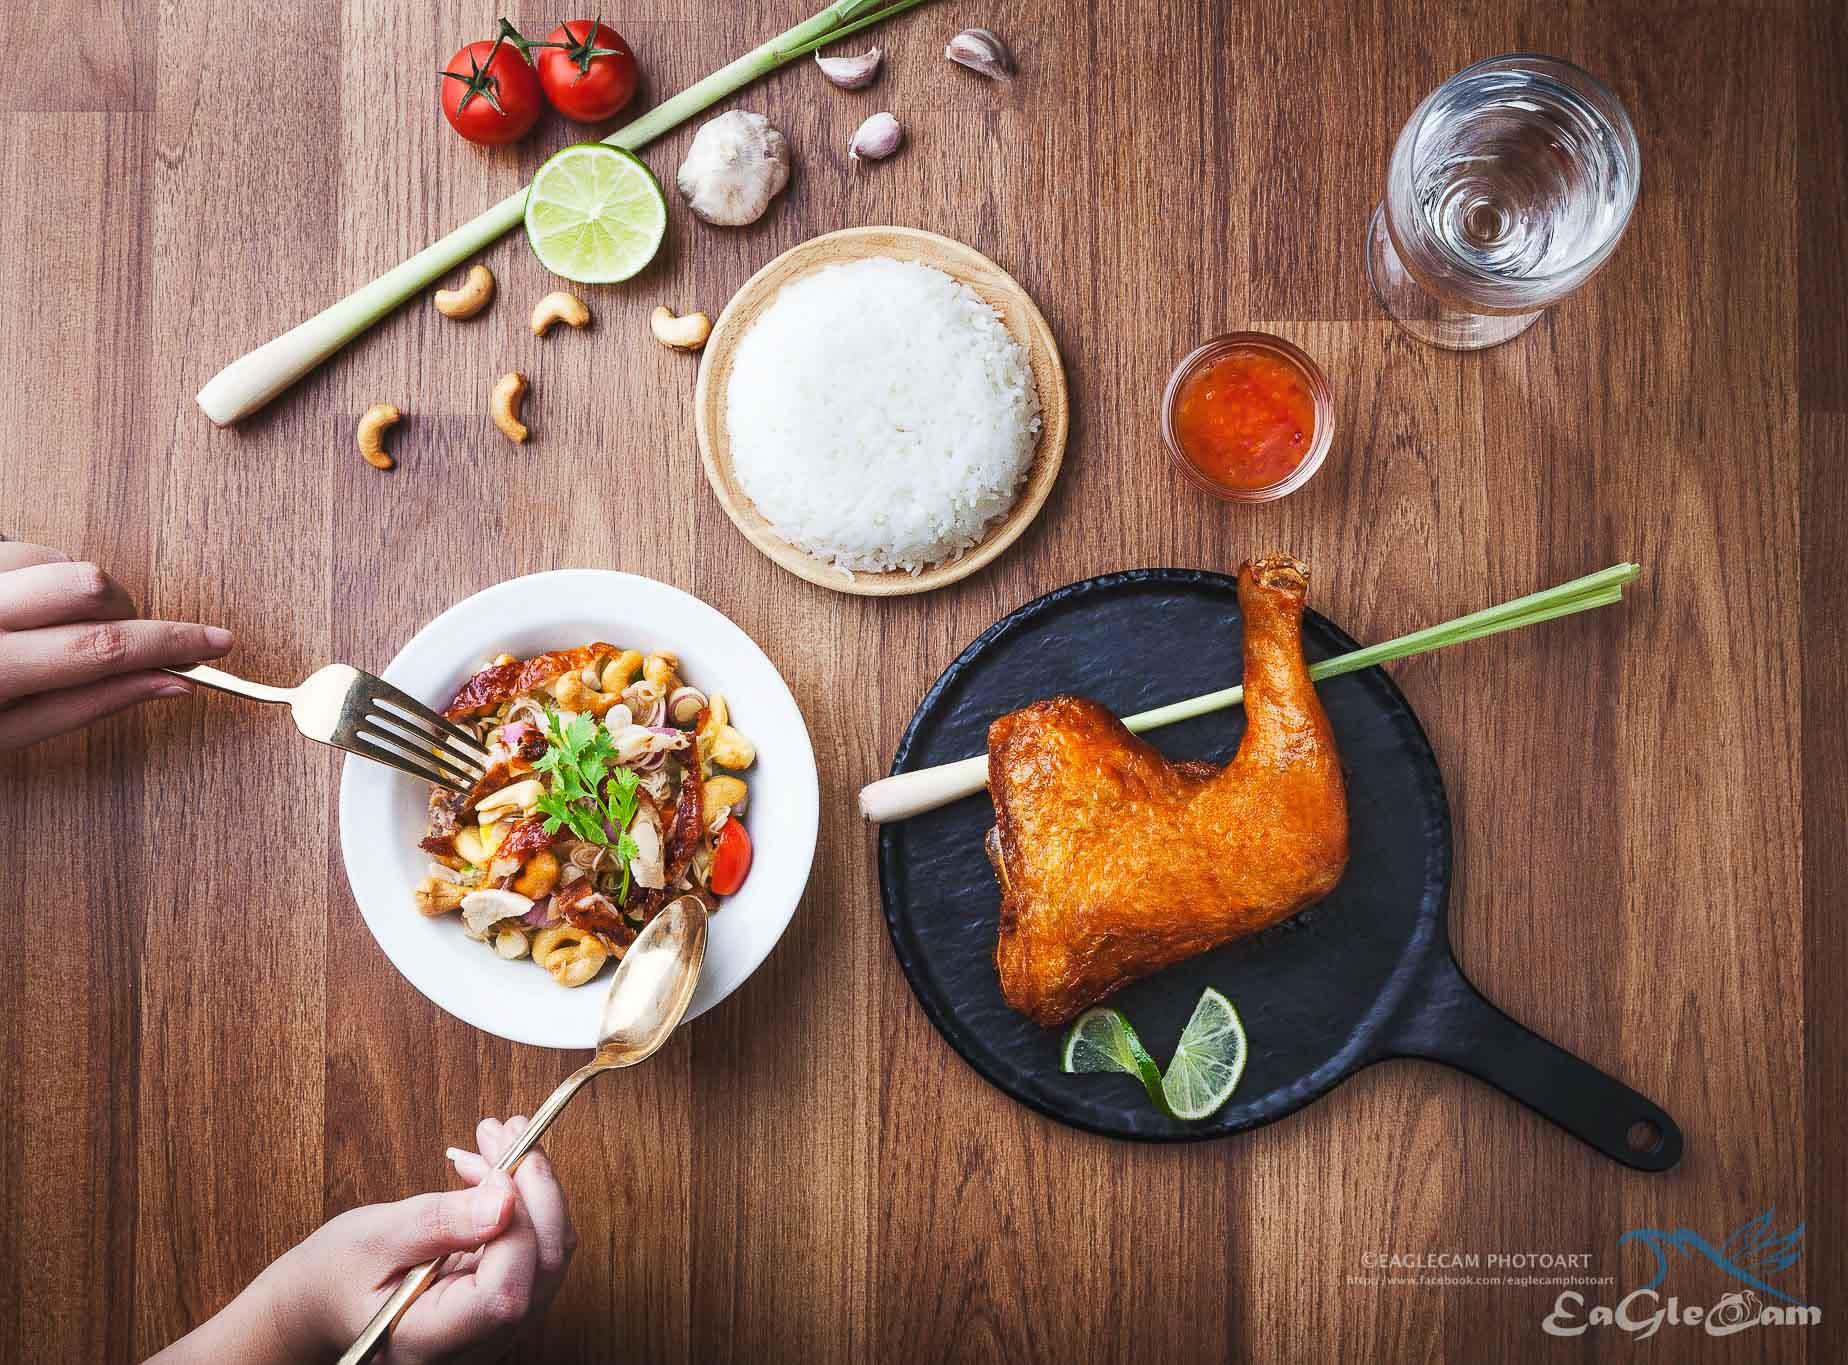 Food Photography #9